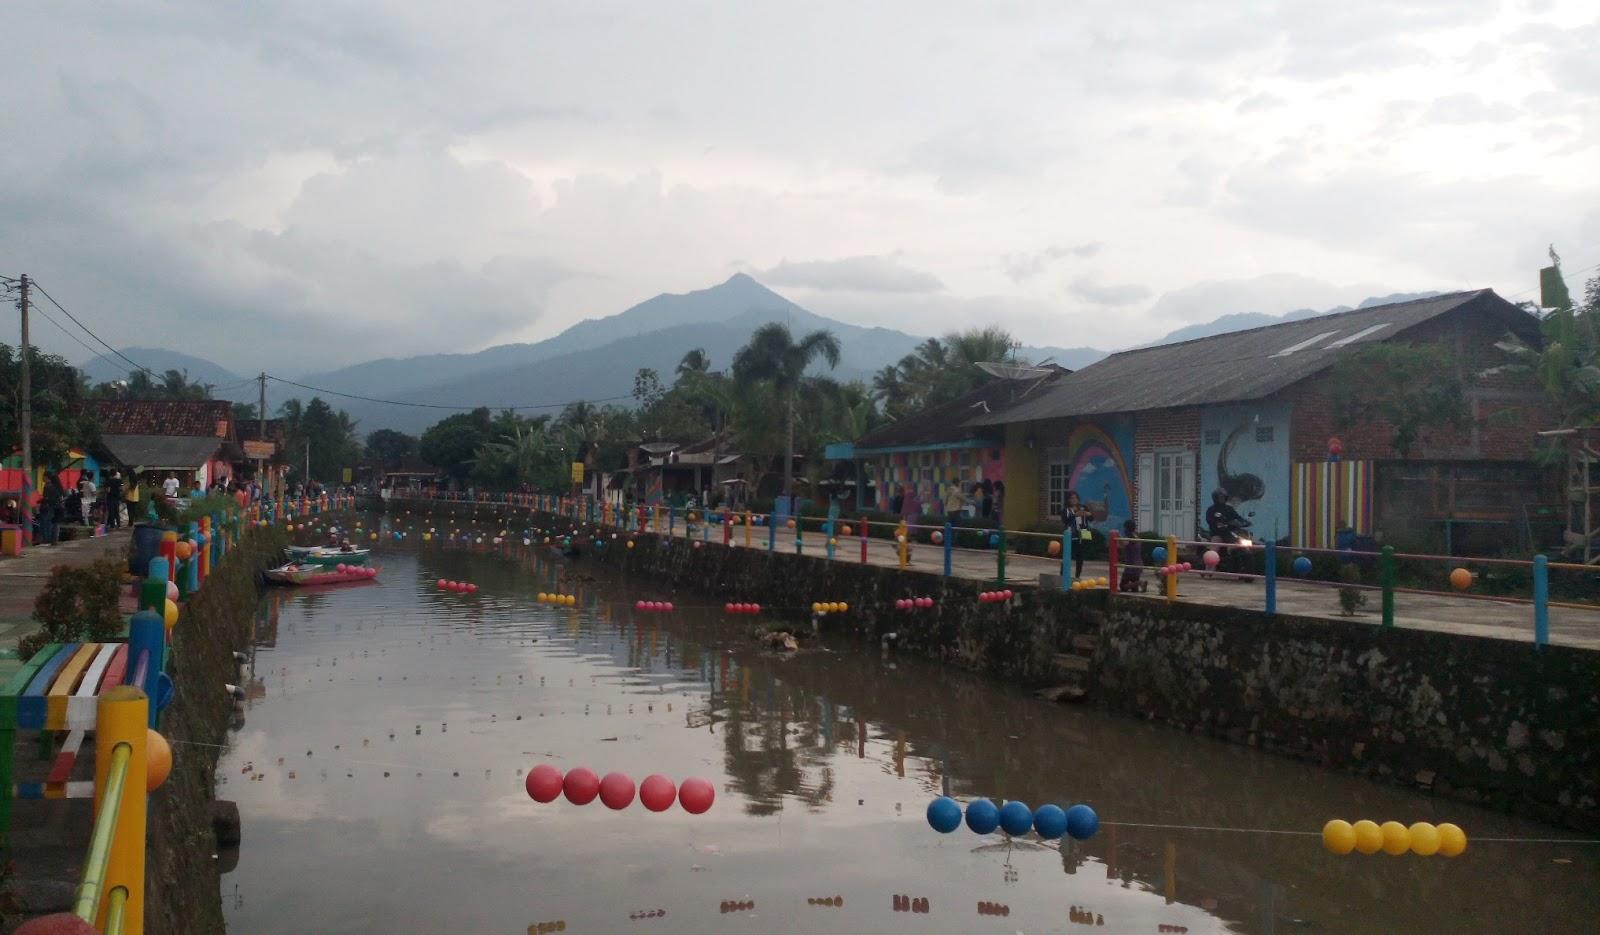 Mengenal Lebih Dekat Desa Wisata Bejalen Ambarawa